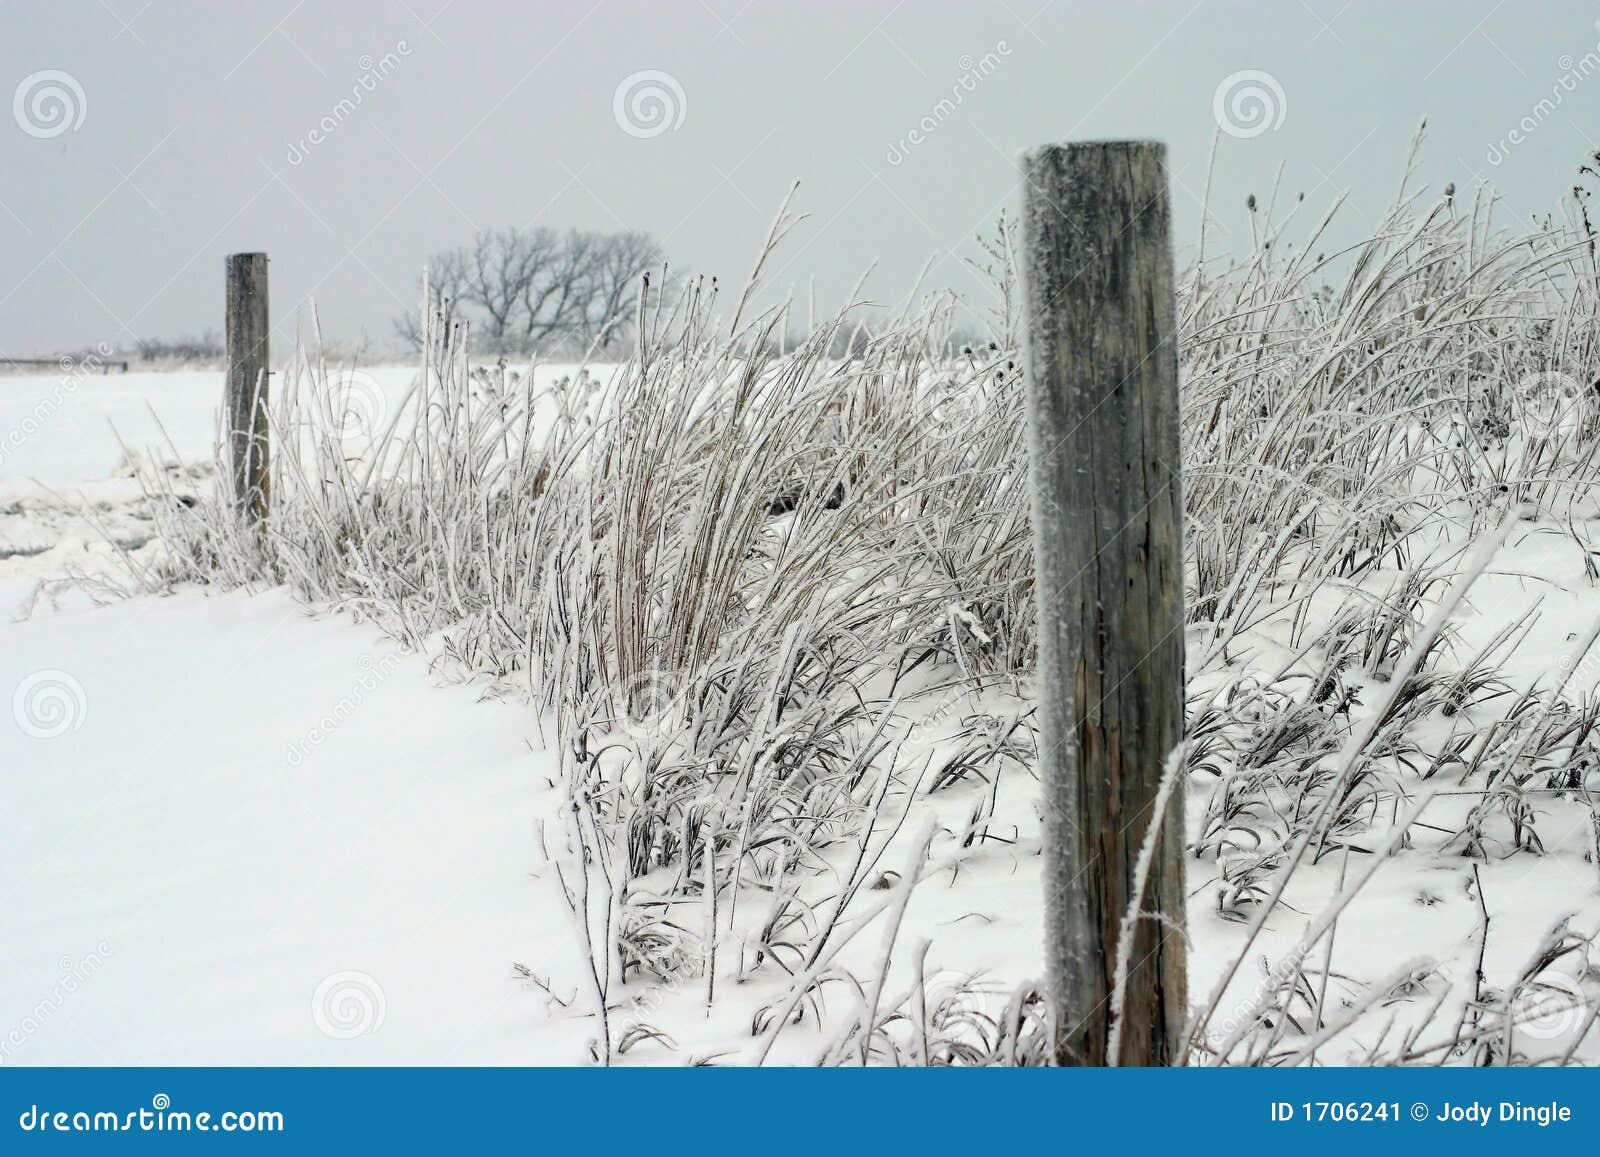 Snow Fence Posts